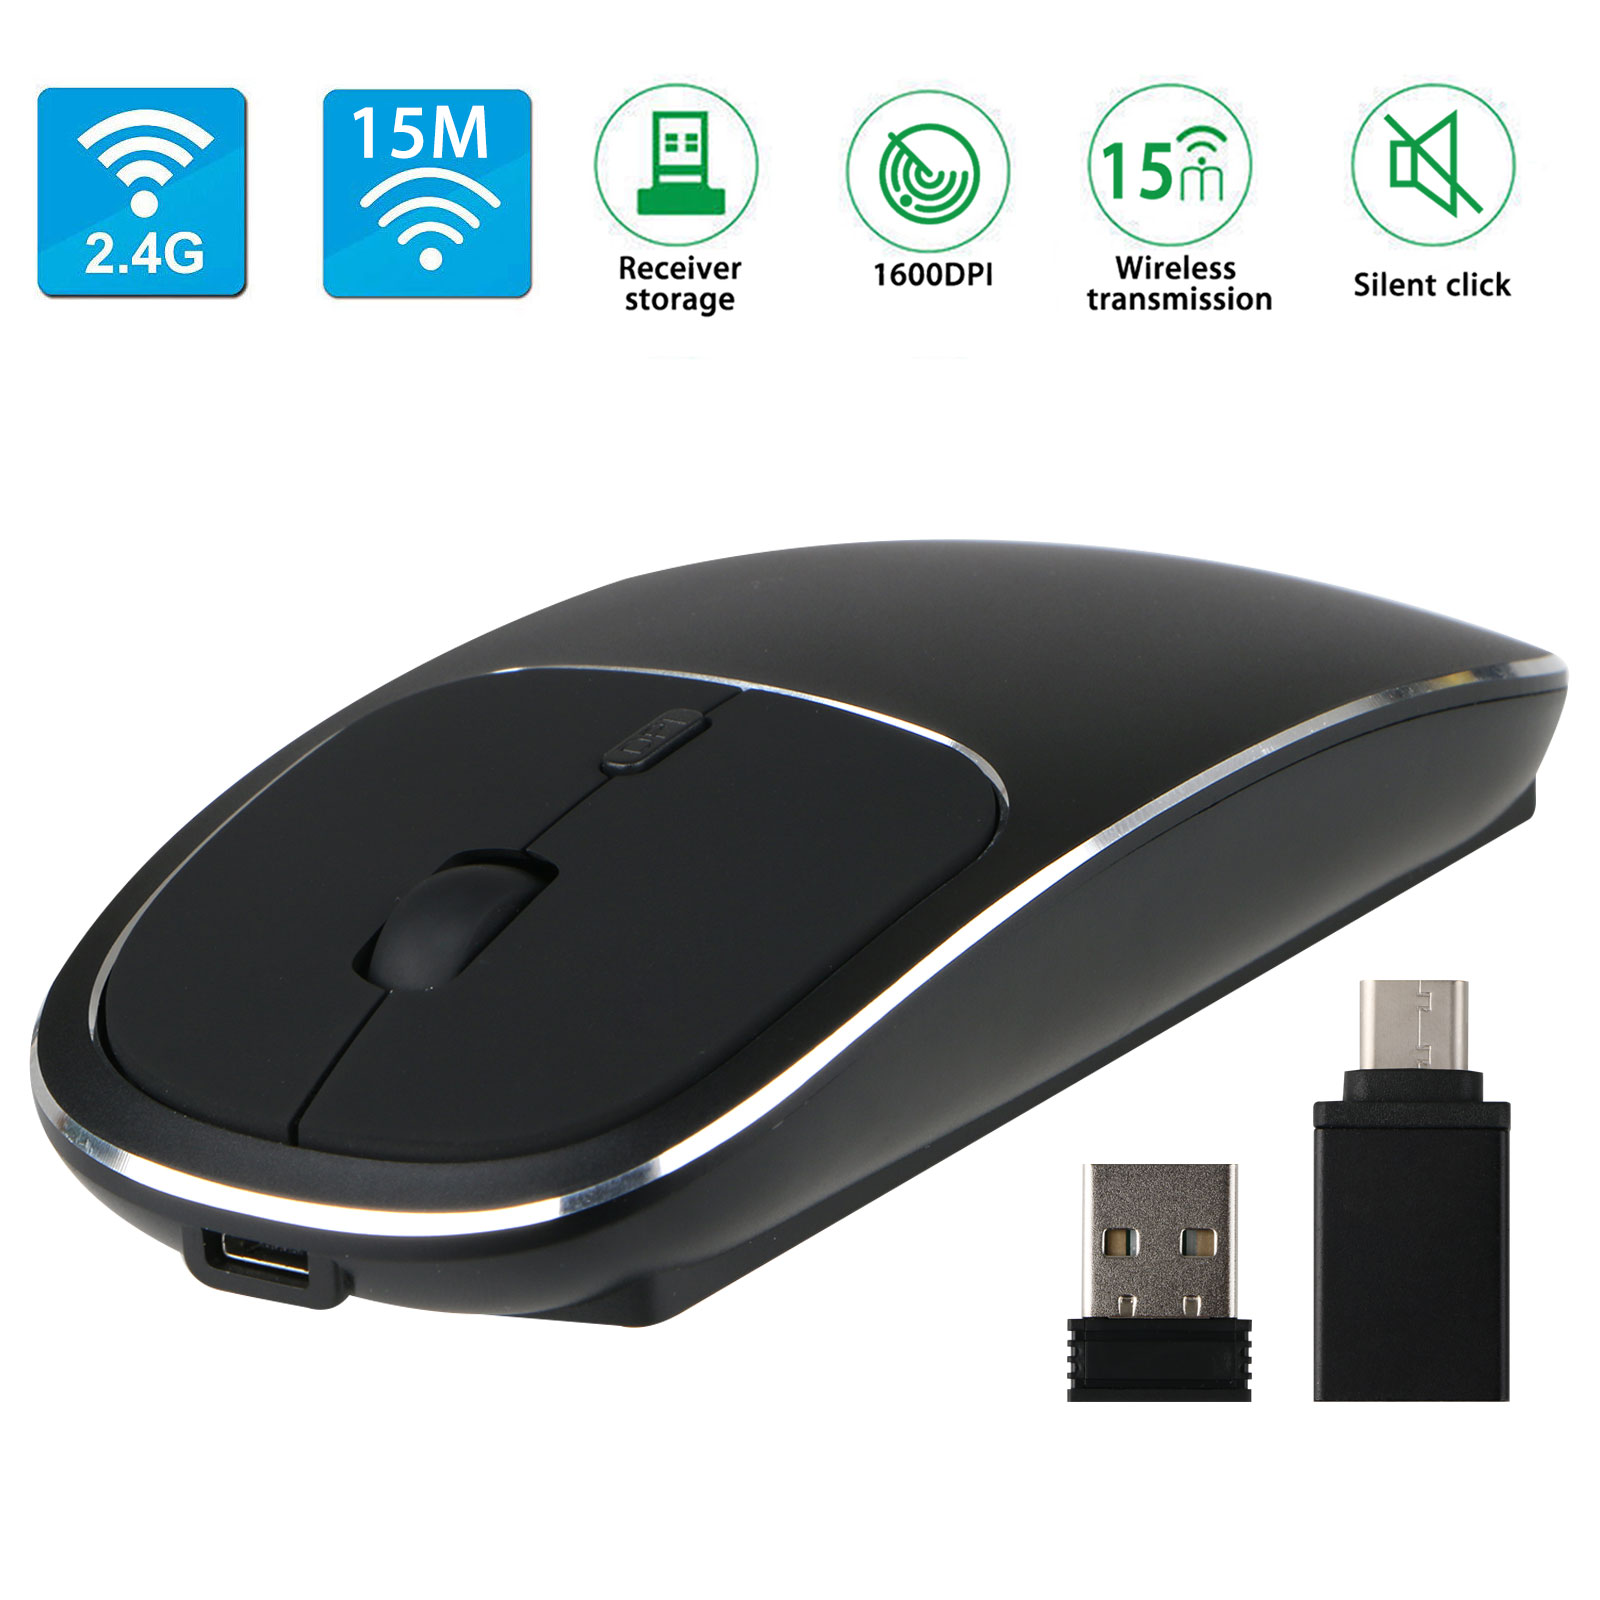 EEEKit Rechargeable Wireless Mouse, 2.4G Slim Mute Silent Click Noiseless USB Optical Mice for Macbook Windows 2000/ 2003/ ME/ XP/ Vista/ Win7/ 8/ 10/ MAC OS/ Linux Laptop Computer